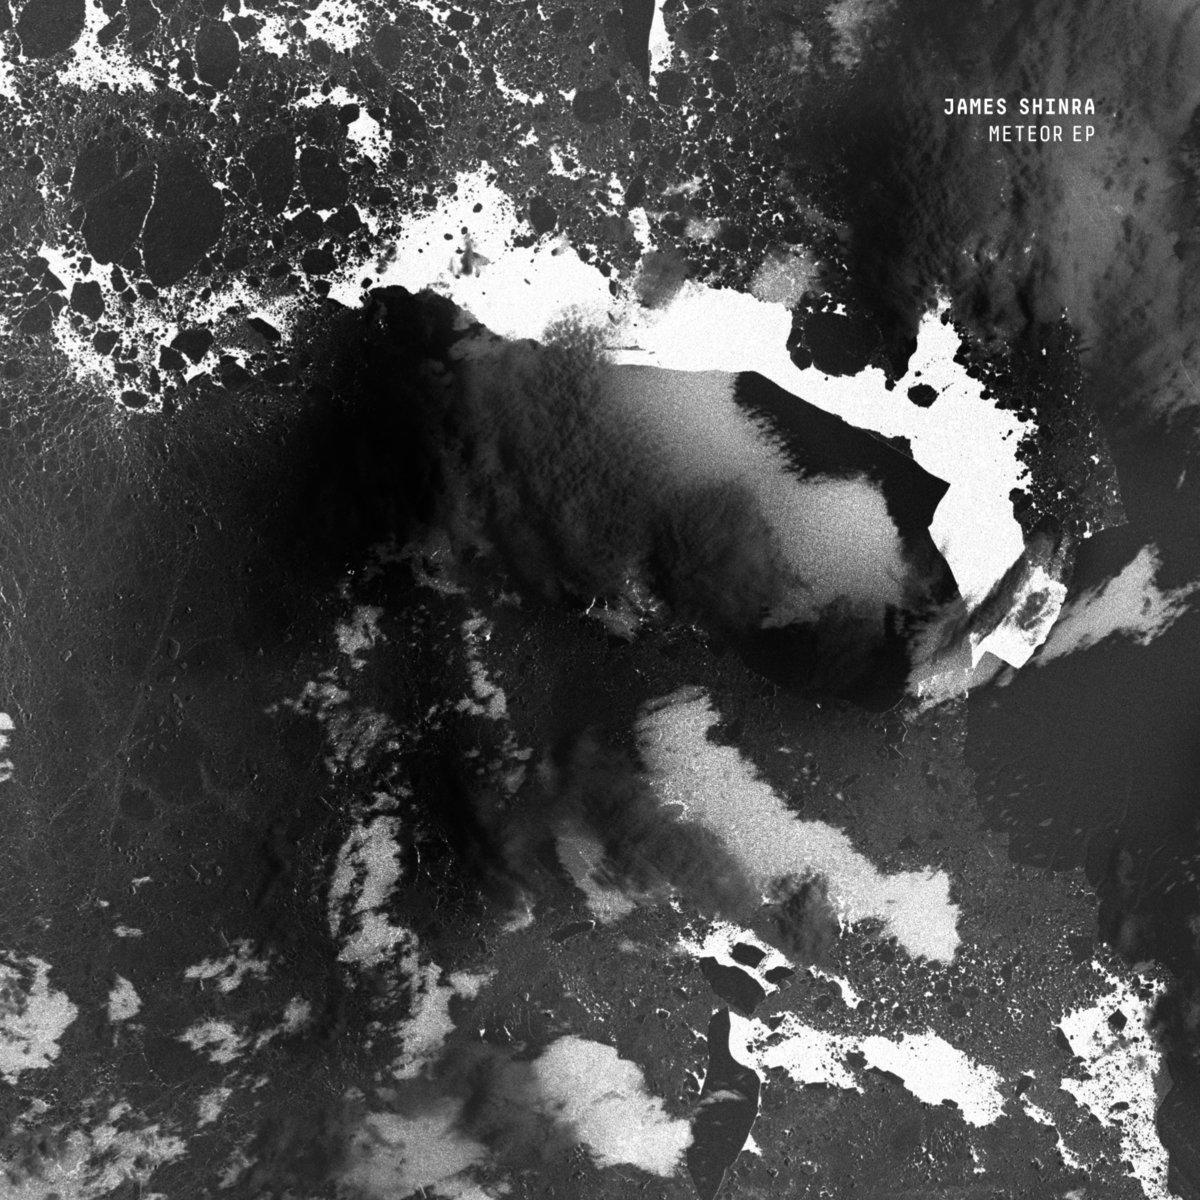 Af006 Meteor Ep Shinra Analogical Force